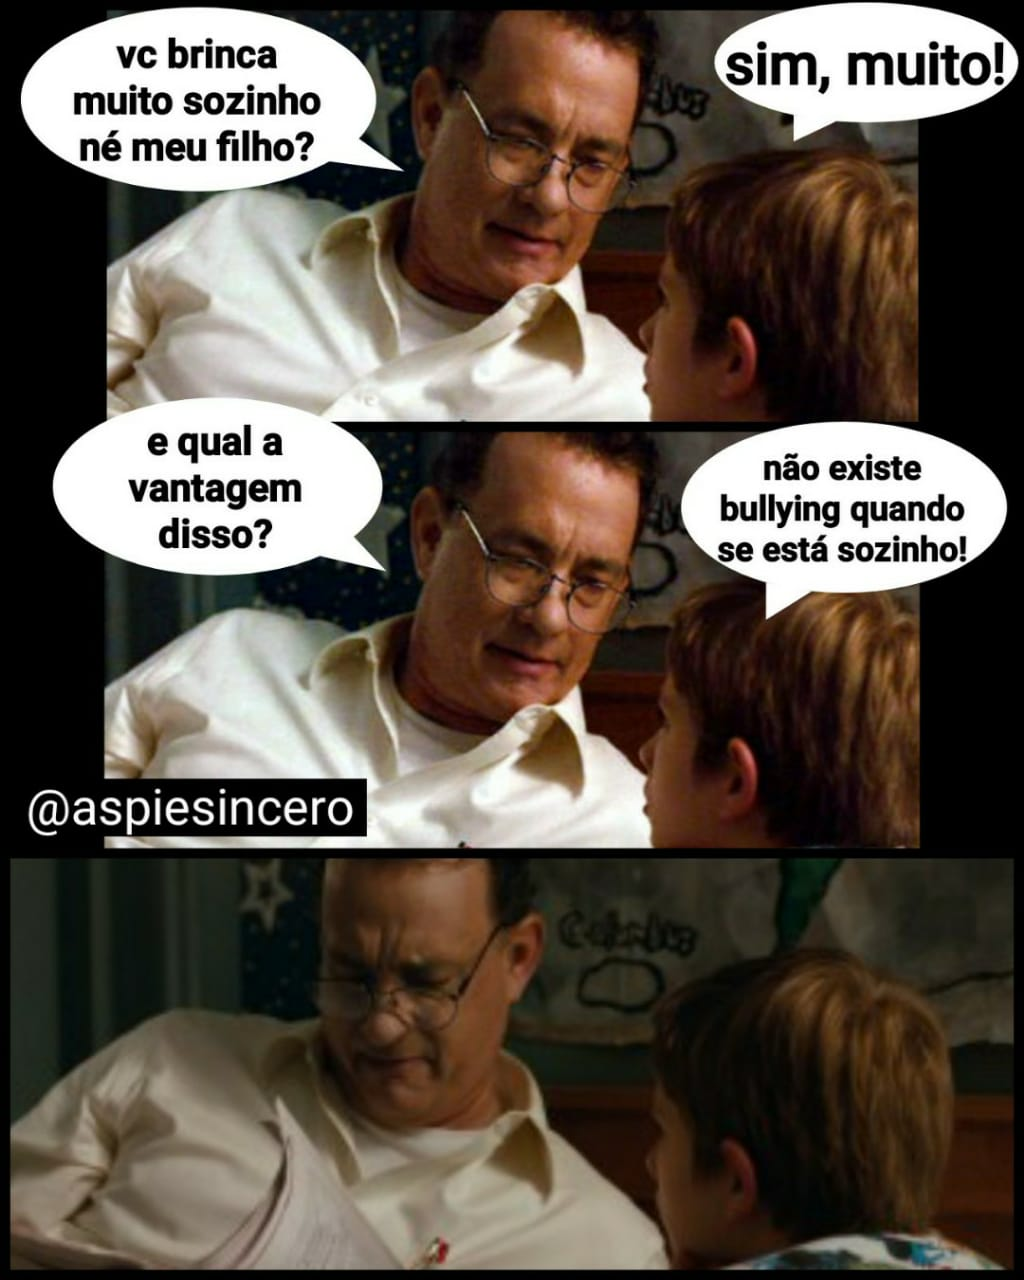 Meme Sincero - A Cura - Revista Autismo